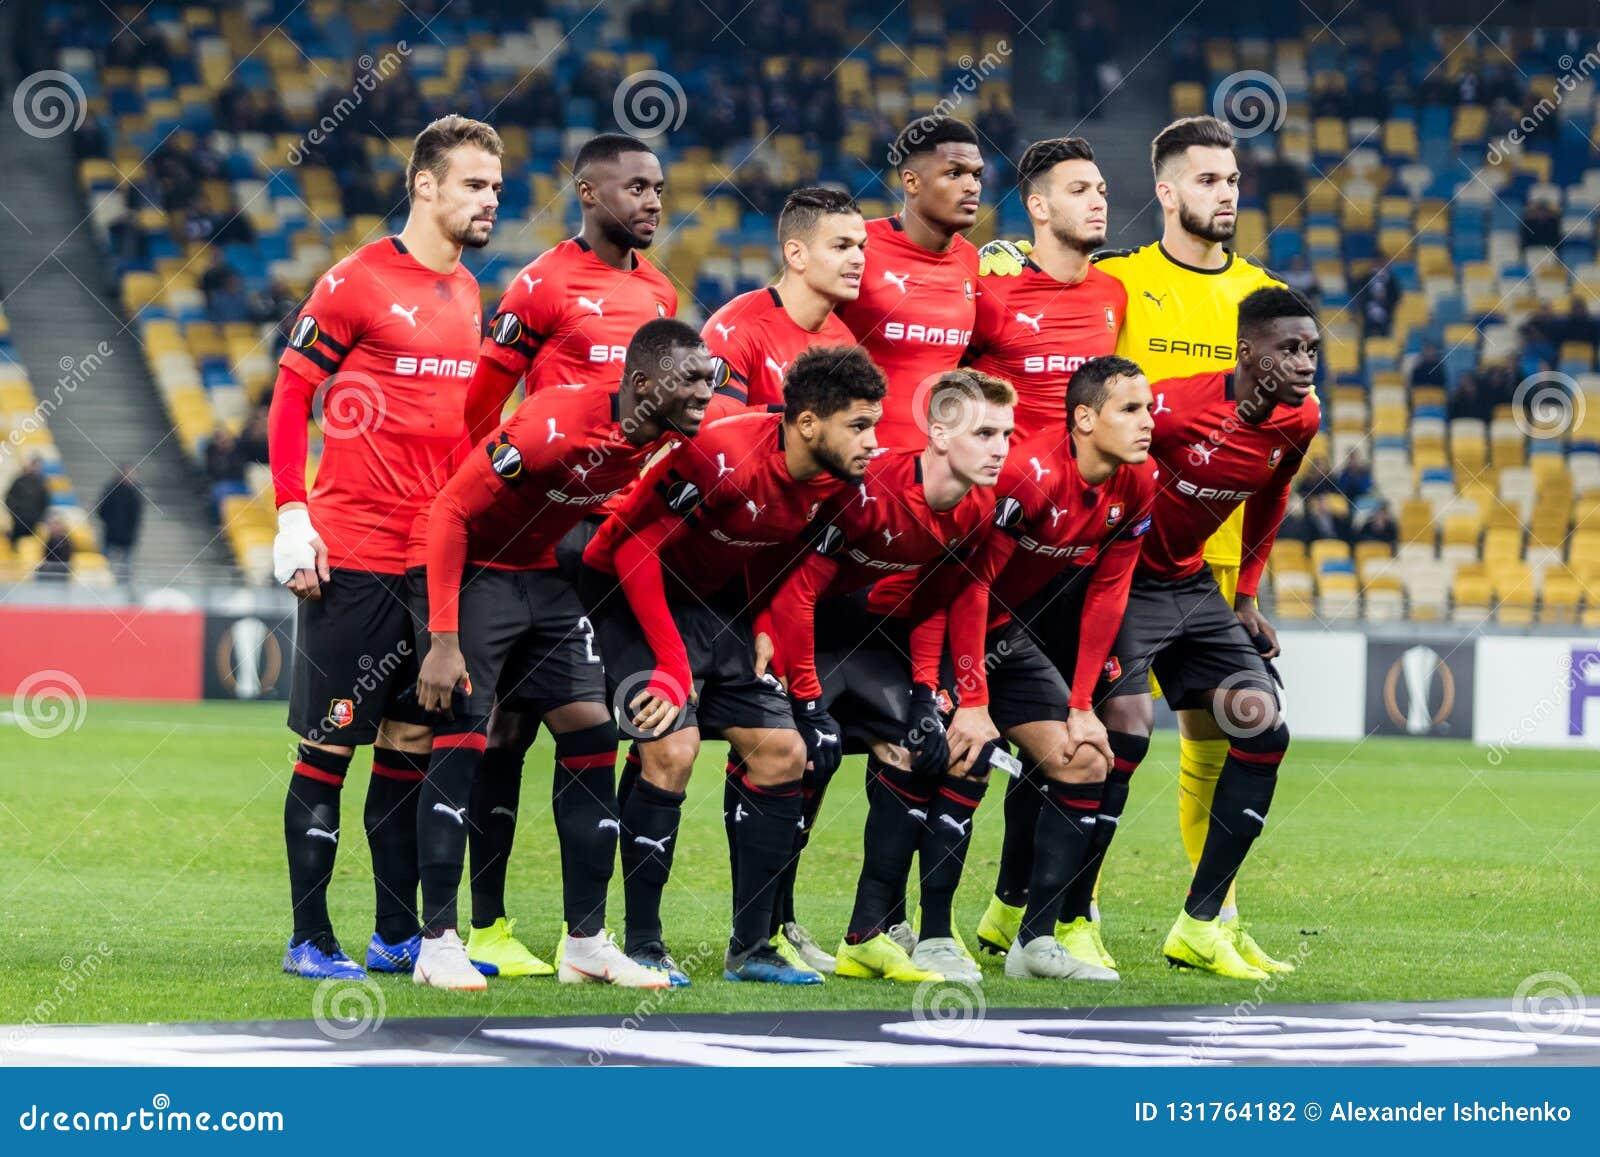 Kyiv, Ukraine - November 8, 2018: Stade Rennais team photo before the start of UEFA Europa League match against Dynamo Kyiv at NSC